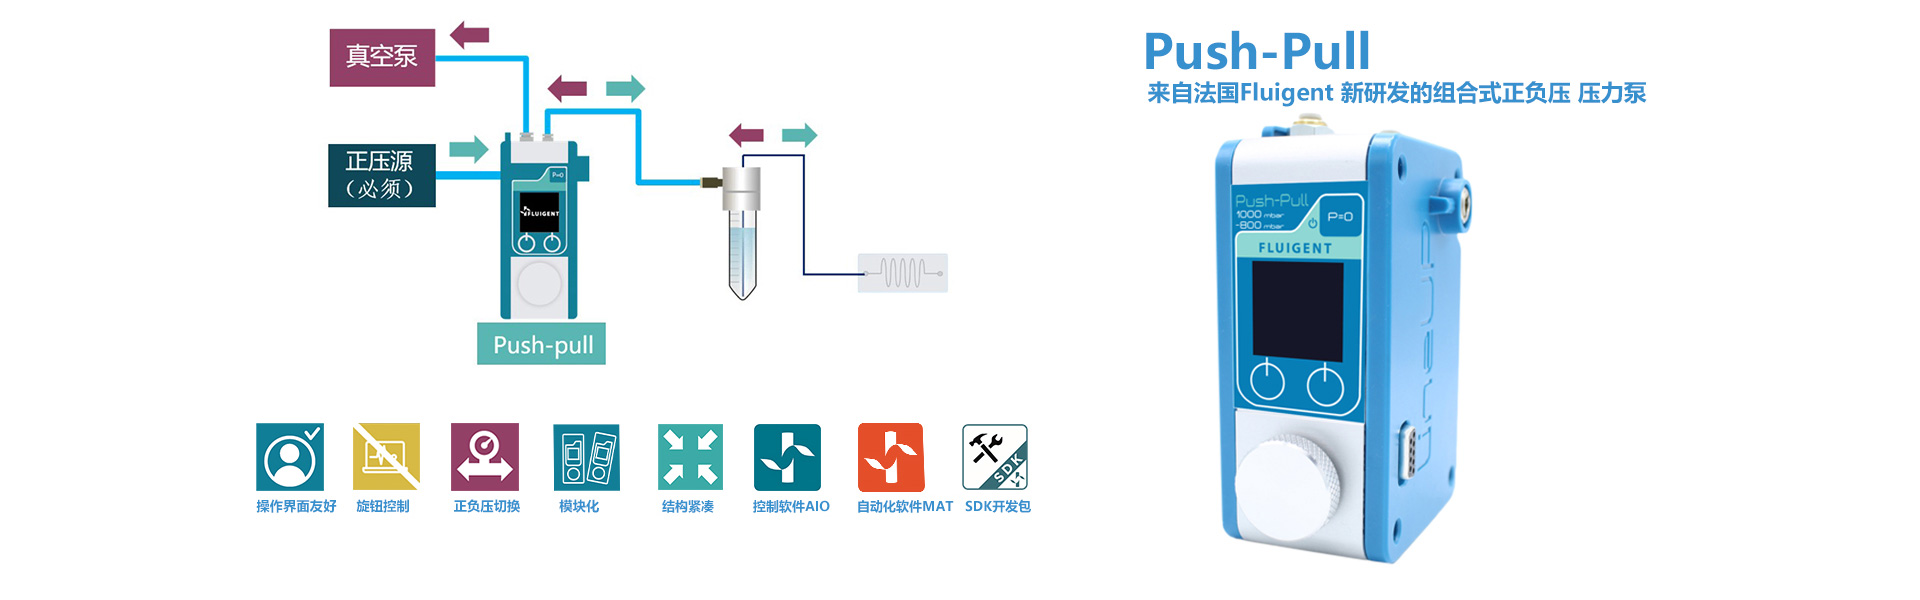 PUSH-PULL